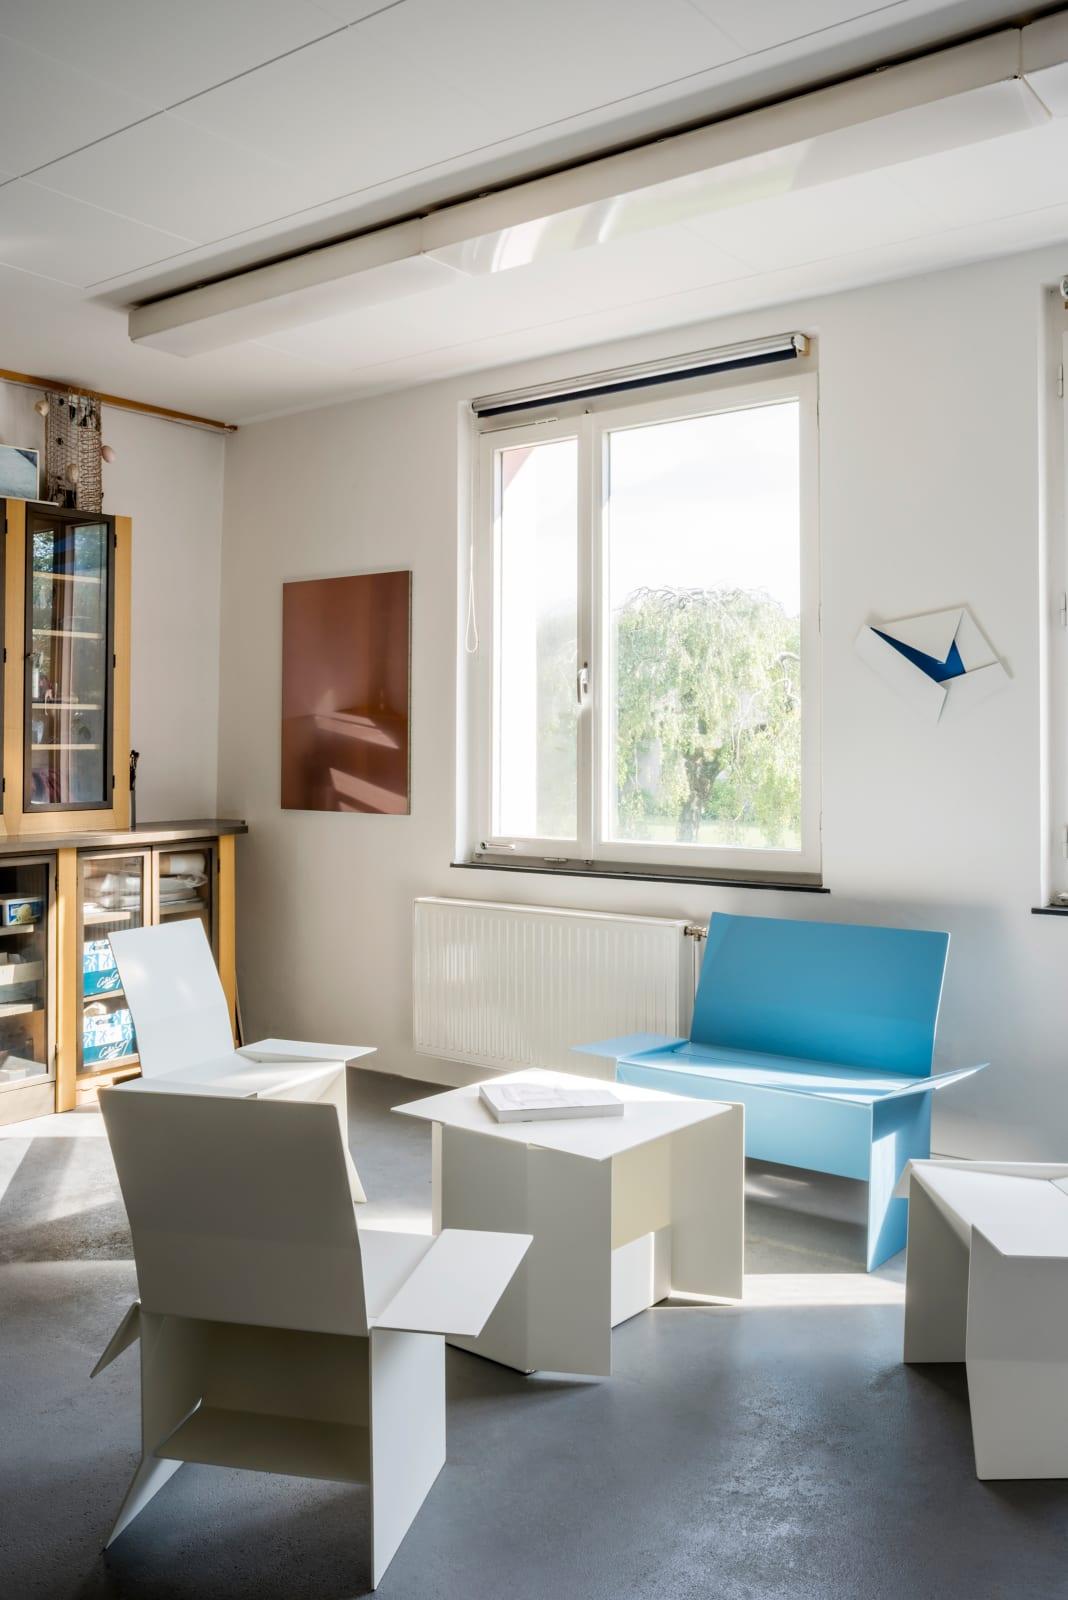 Studio Sébastien de Ganay Photo: Simon Veres